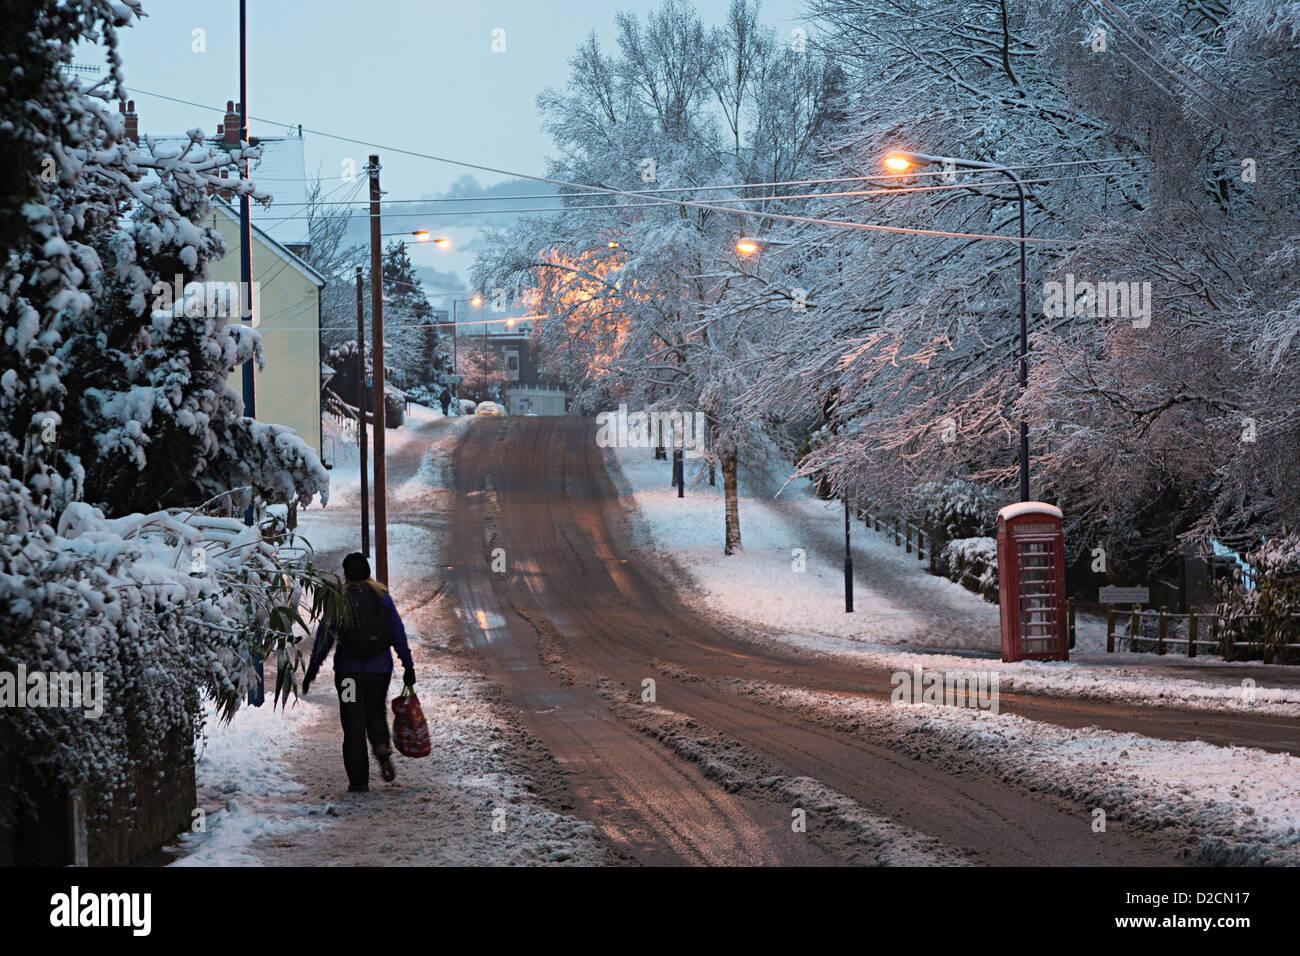 Mujer caminando con bolsa de compras sobre pavimento resbaladizo en Winter Street al anochecer, Abergavenny, Wales, Imagen De Stock